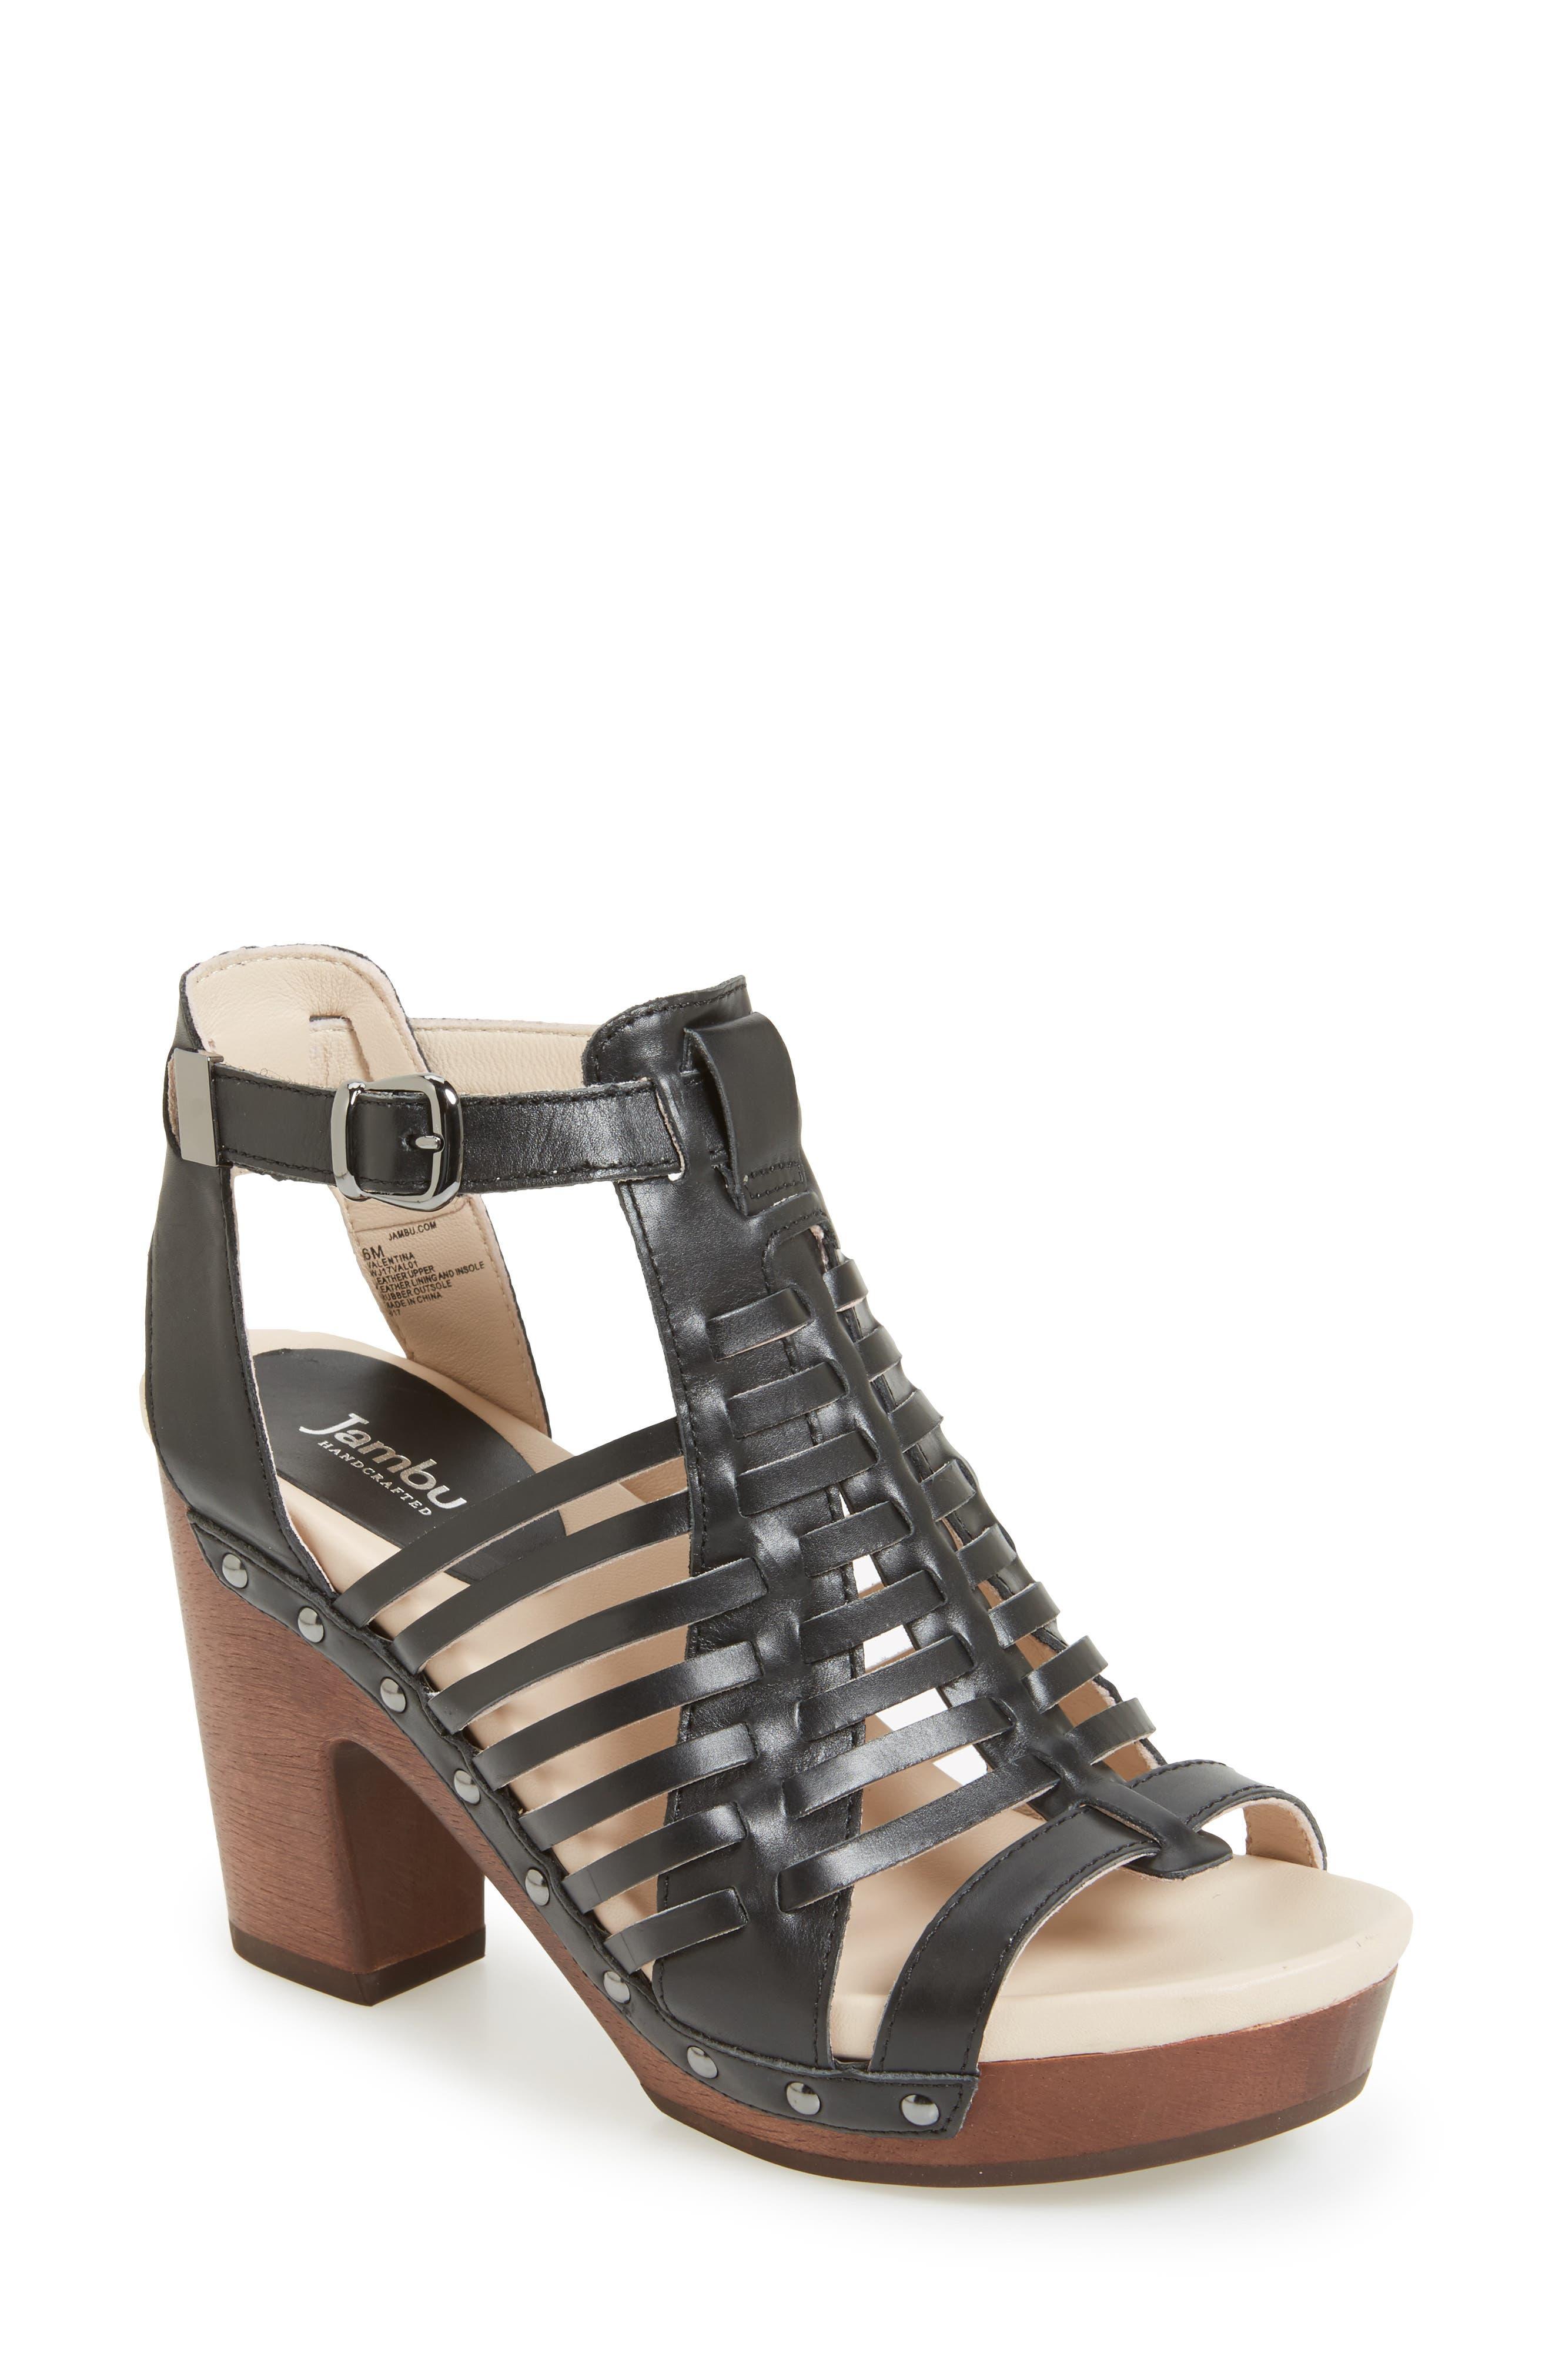 Main Image - Jambu Valentina Strappy Sandal (Women)